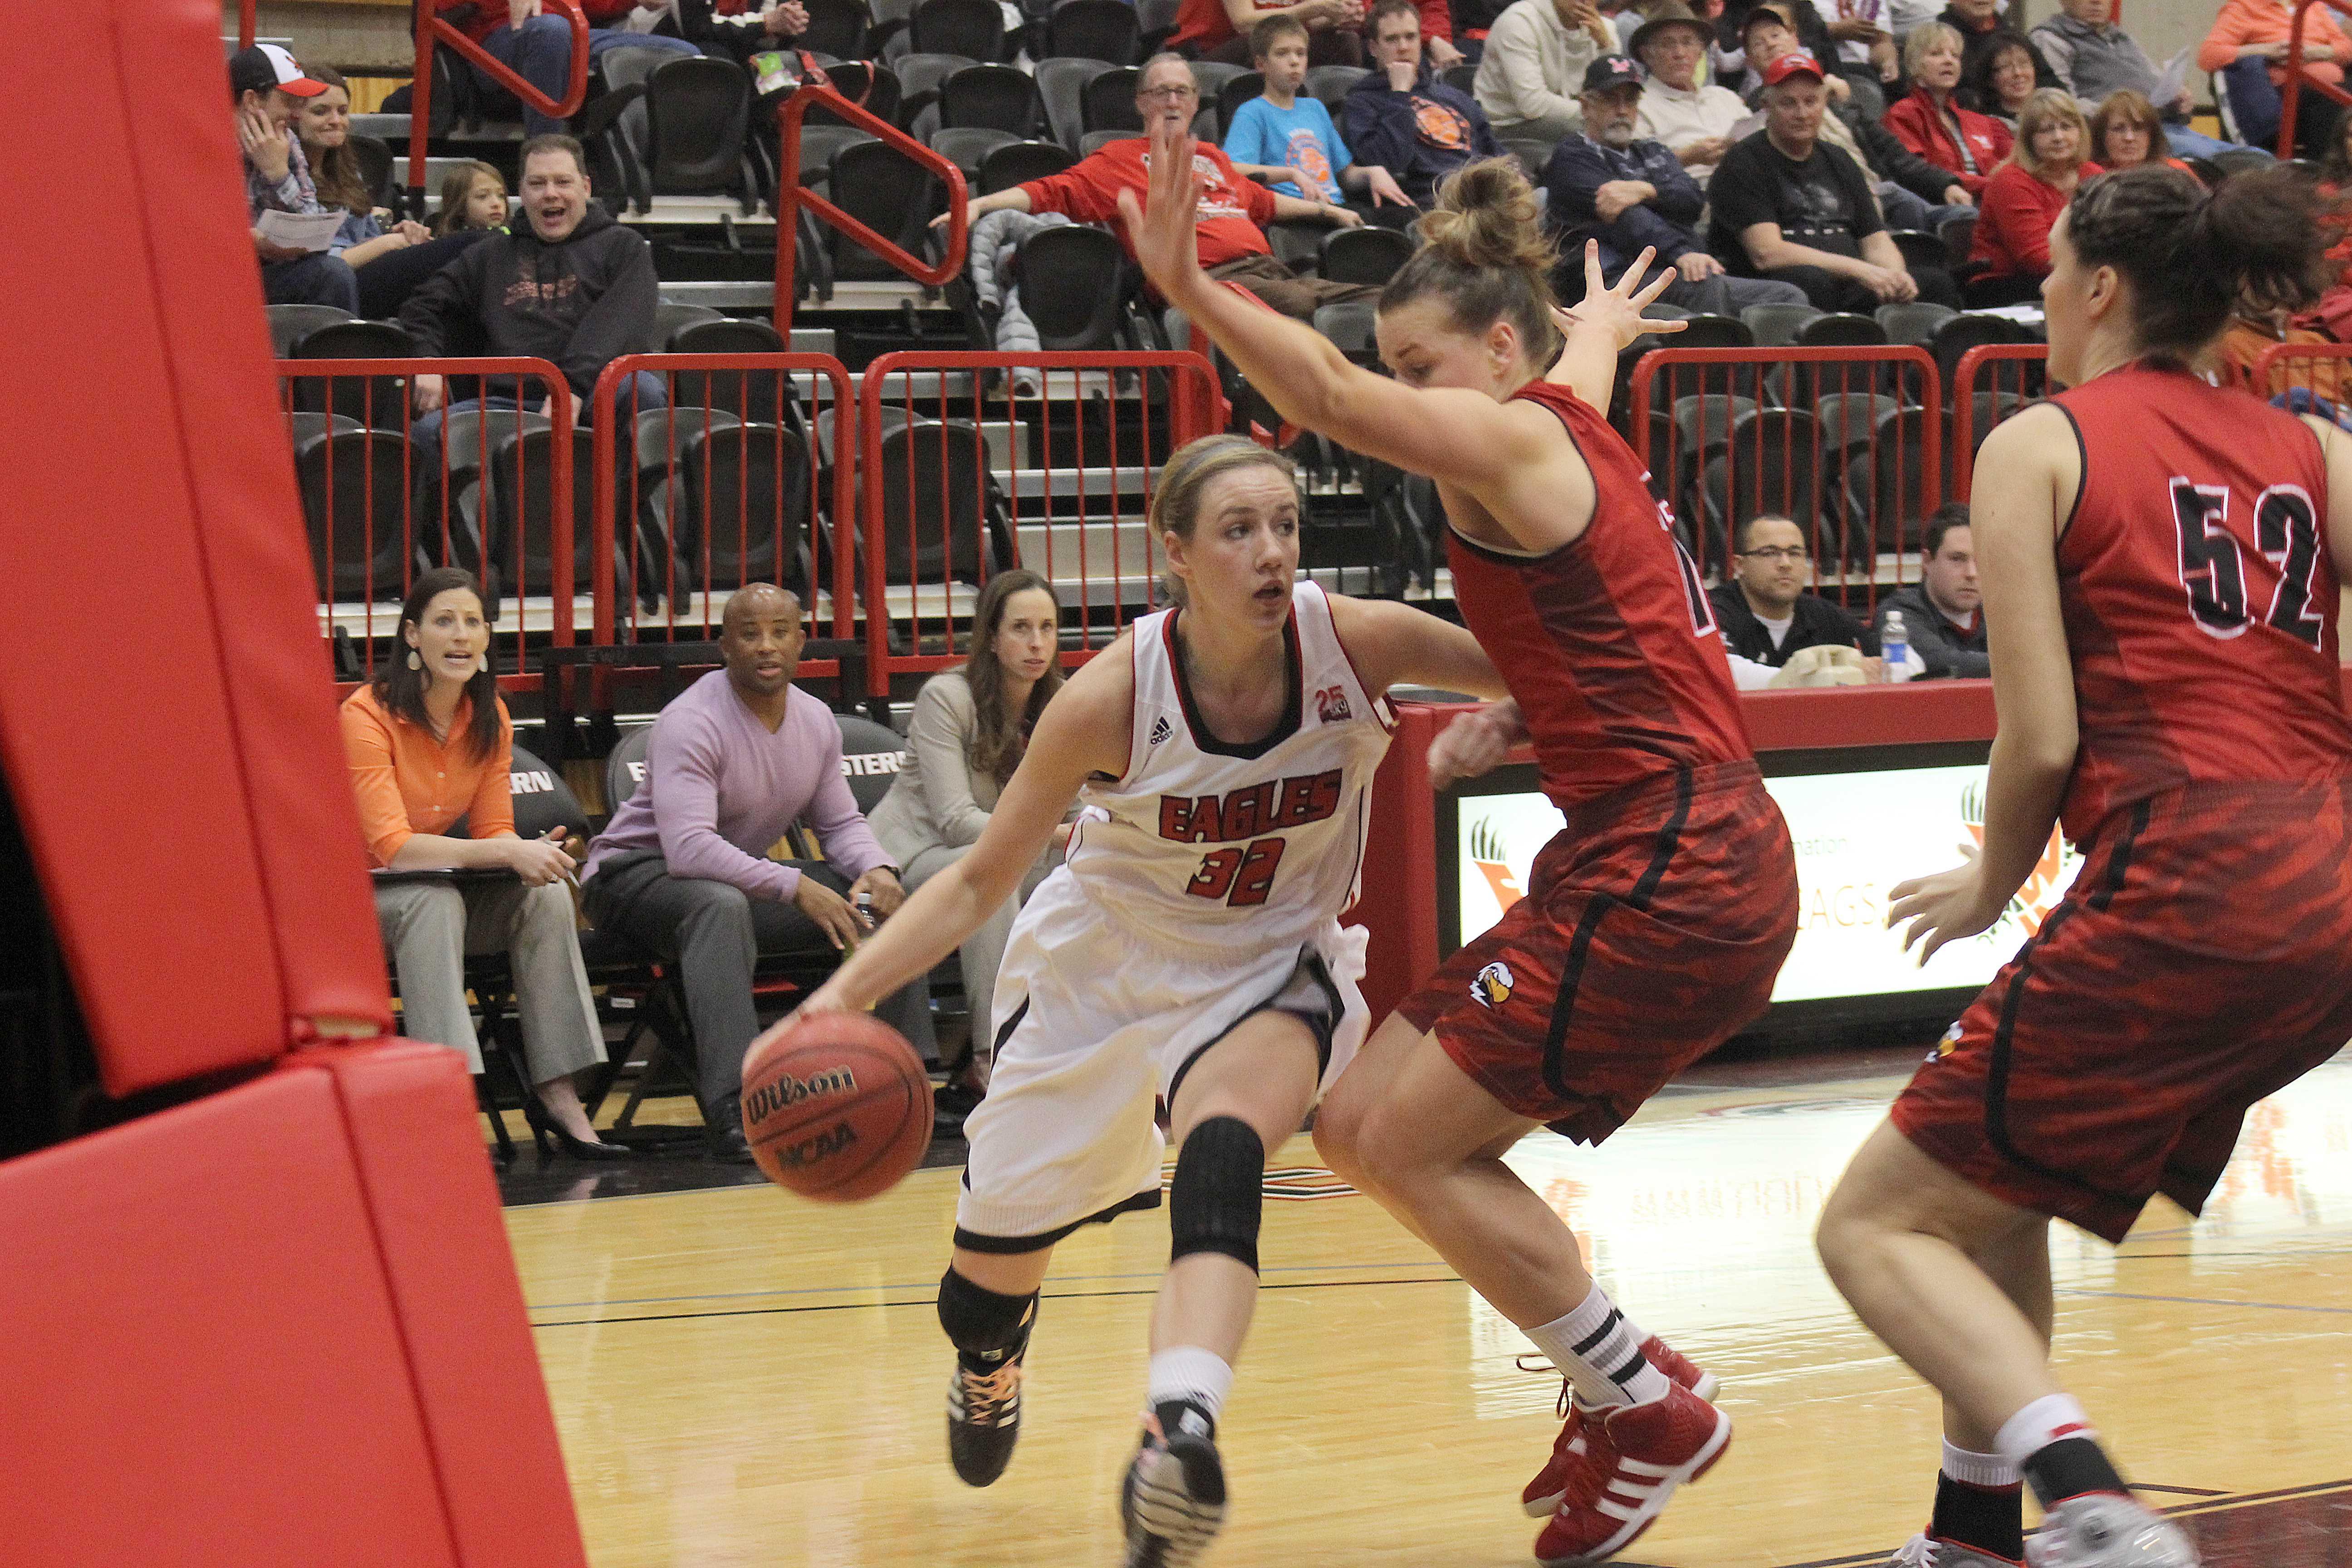 Senior guard Aubrey Ashenfelter drives to the basket against Southern Utah.